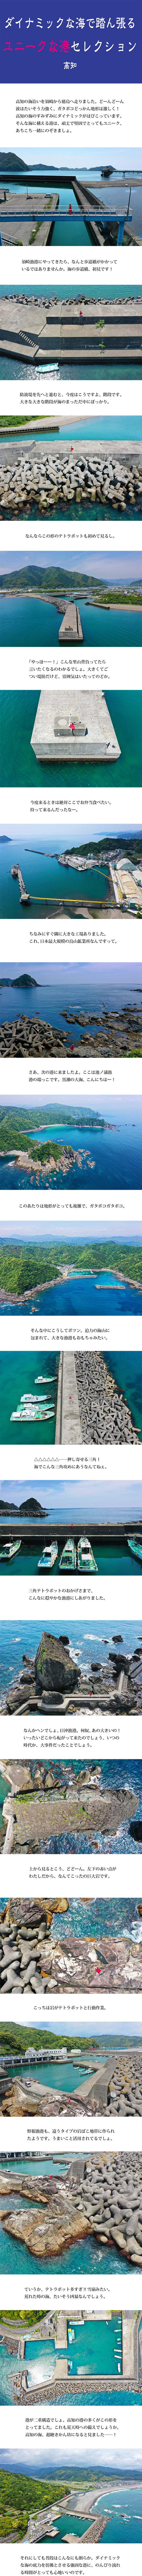 tomako190704.jpg